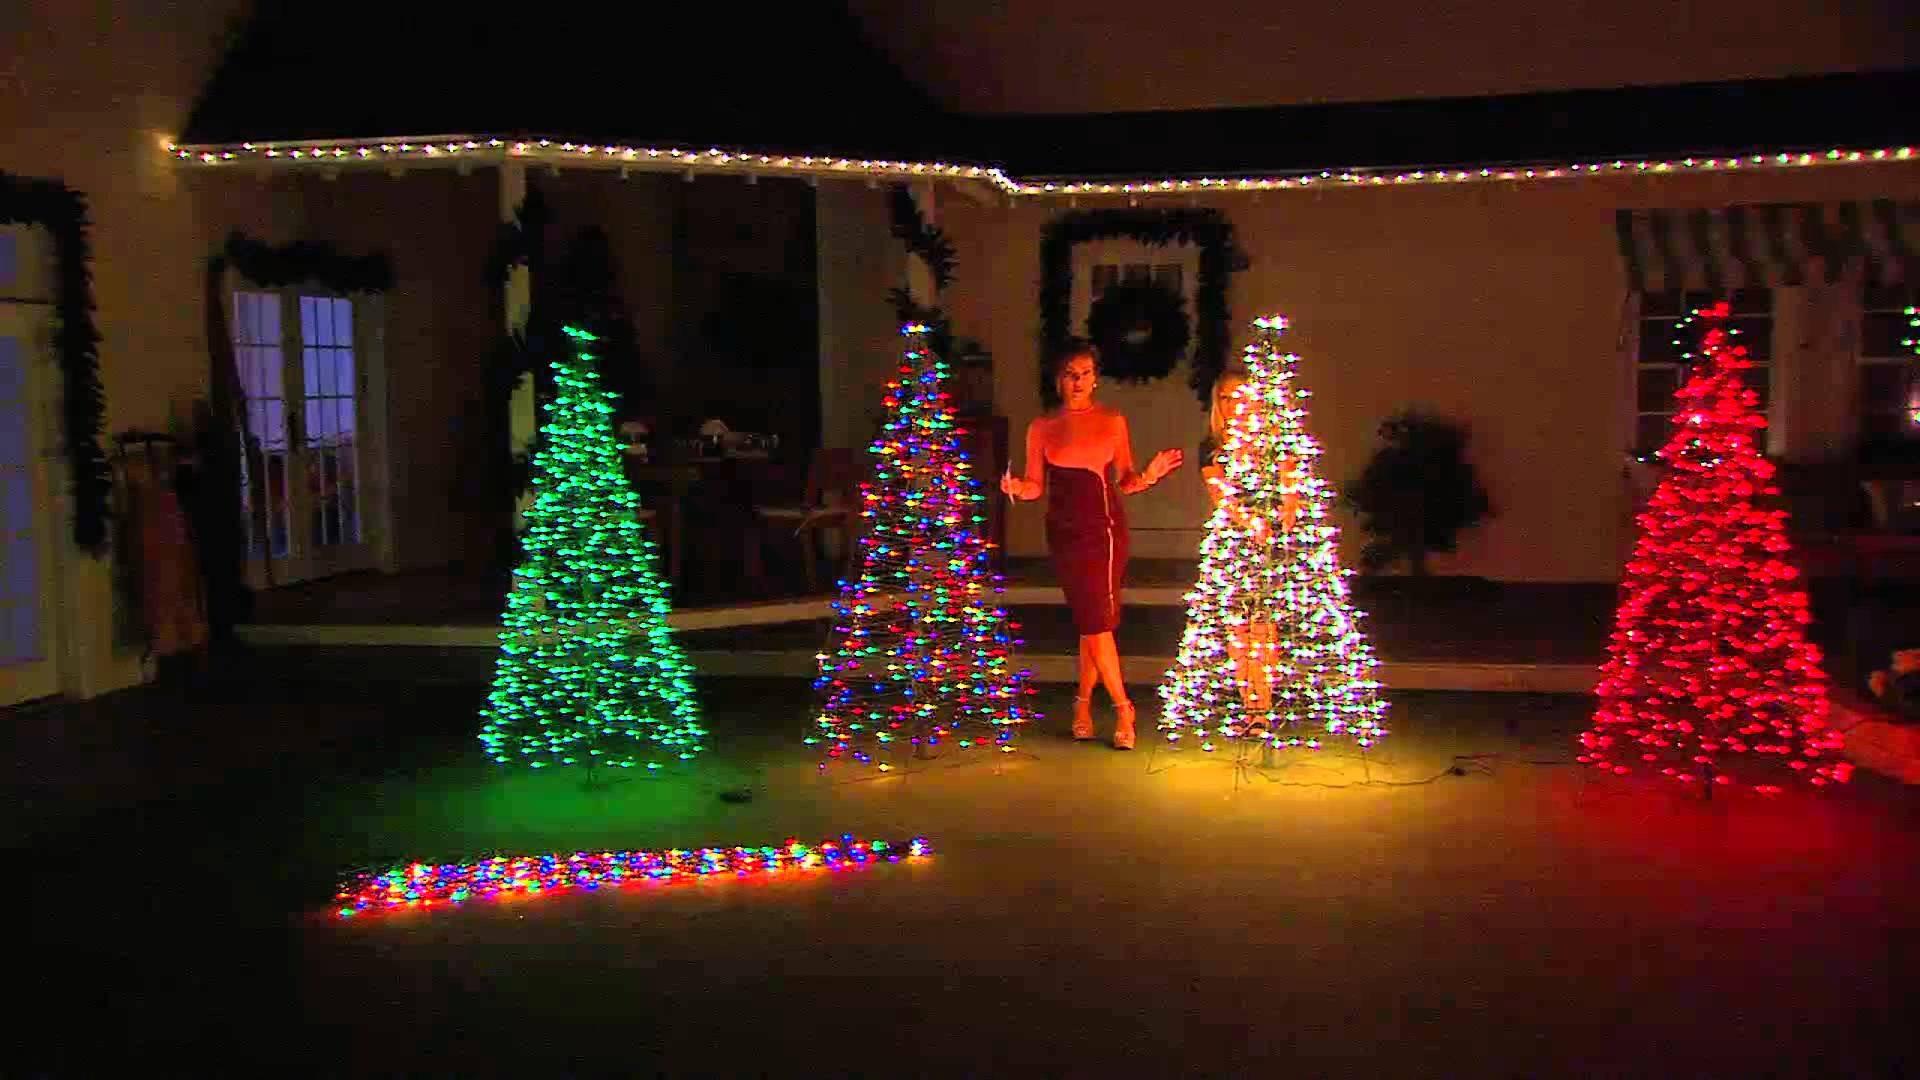 Outdoor Light Up Christmas Tree  Outdoor Lighted Christmas Tree